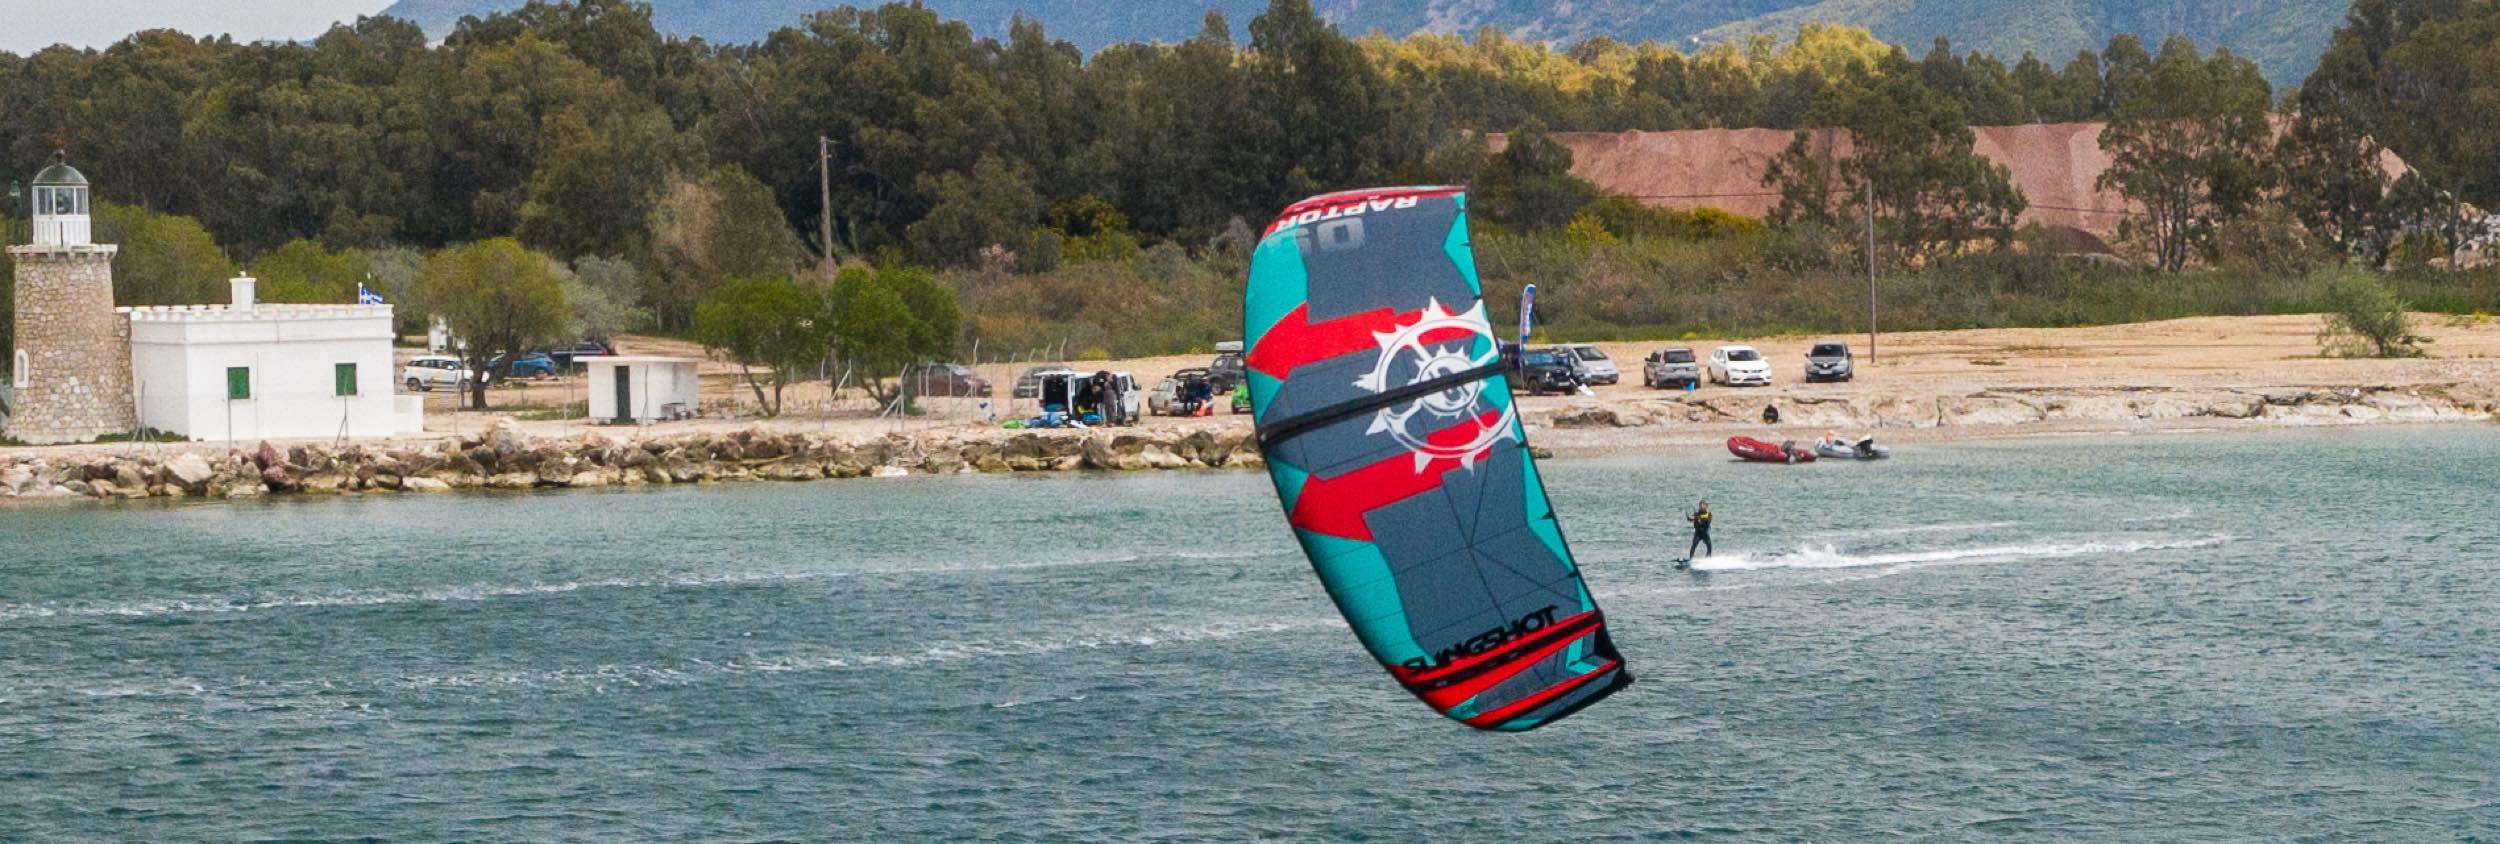 Raptor kite 2020